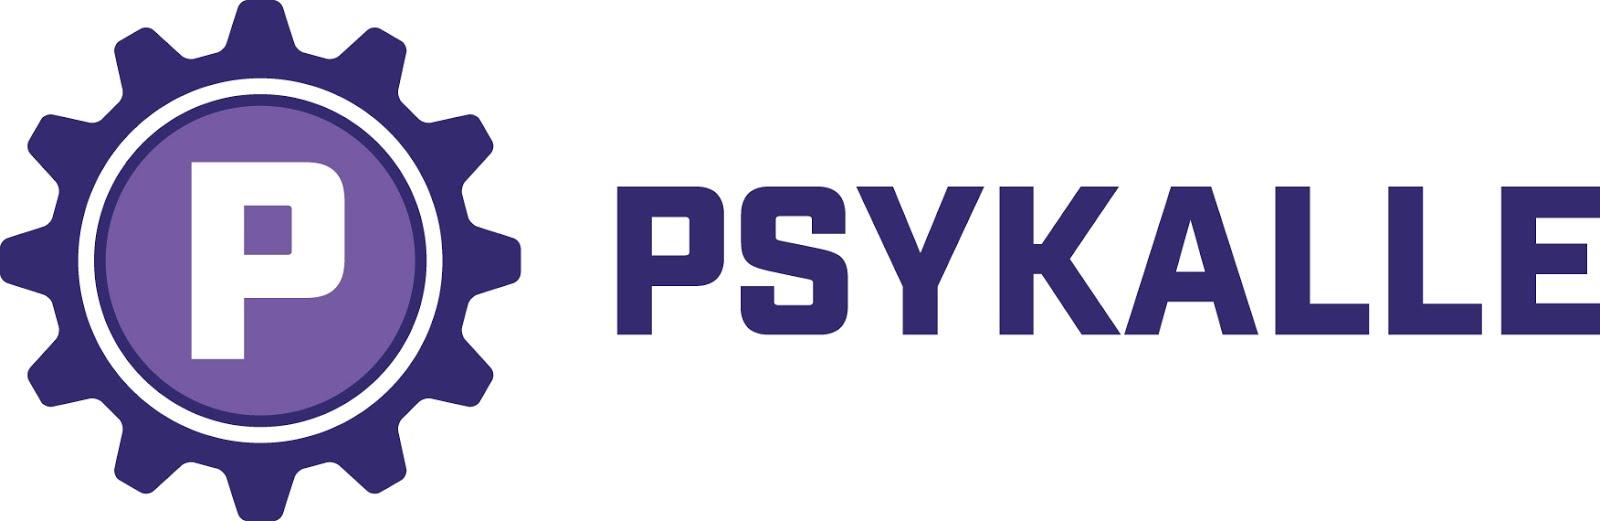 Psykalle.fi